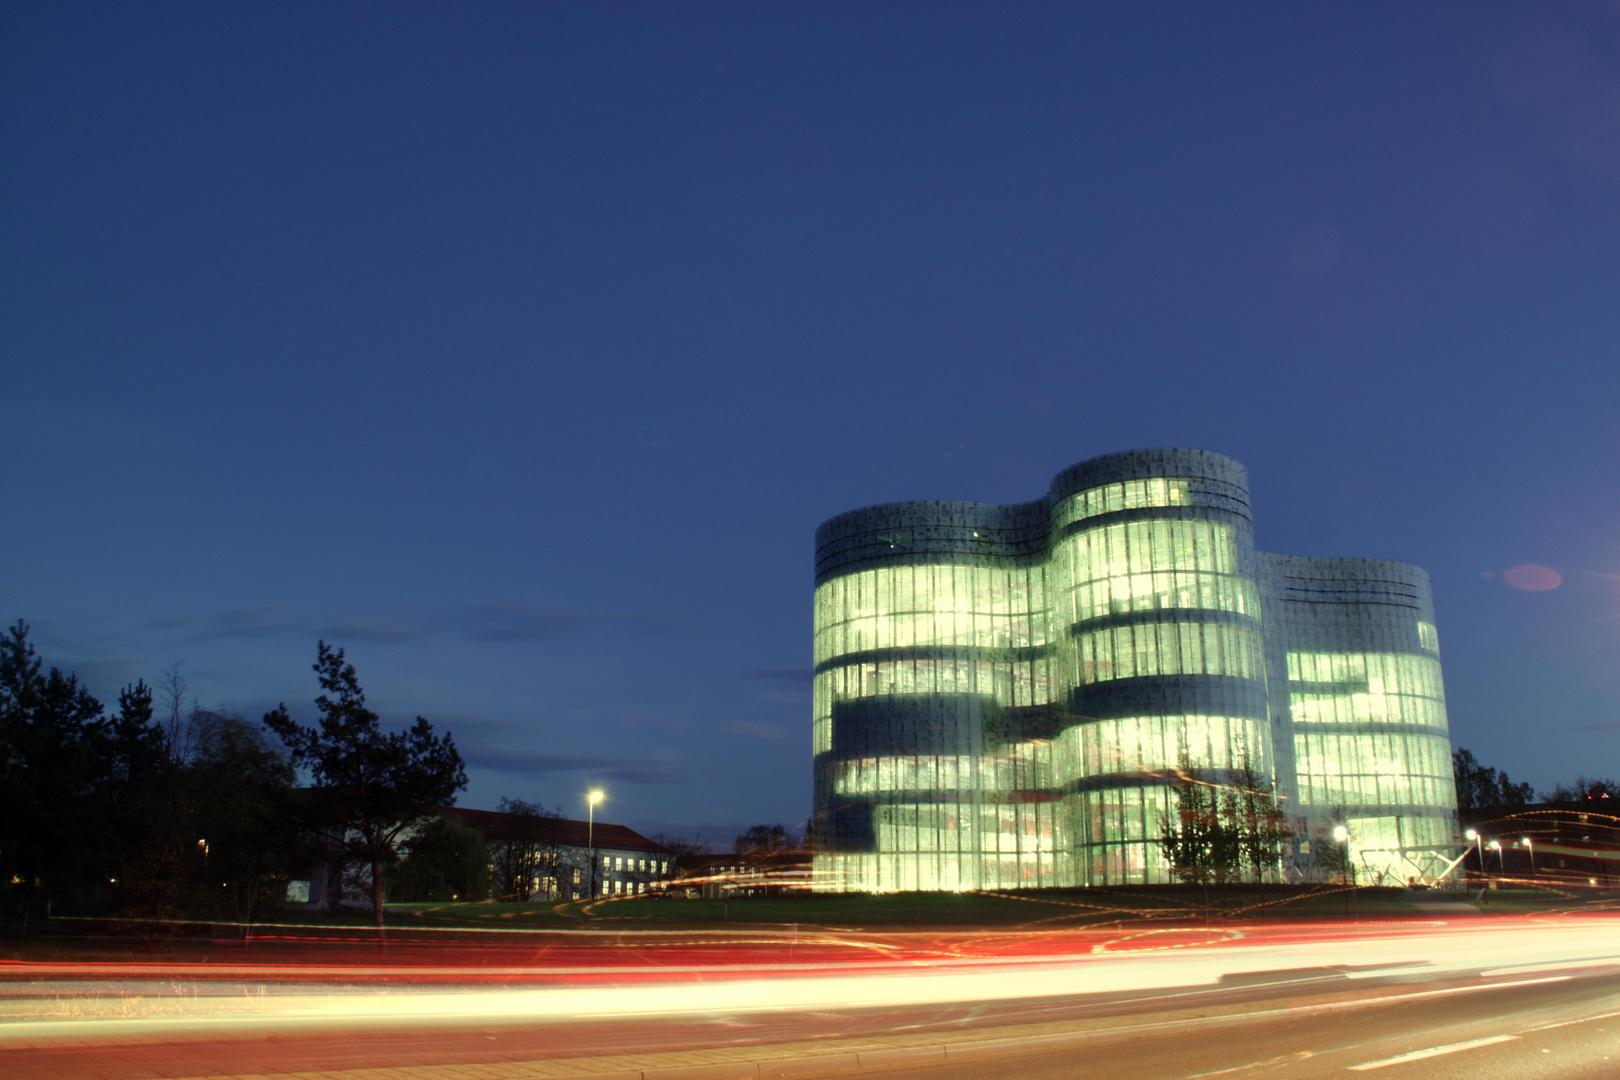 BTU Bibliothek